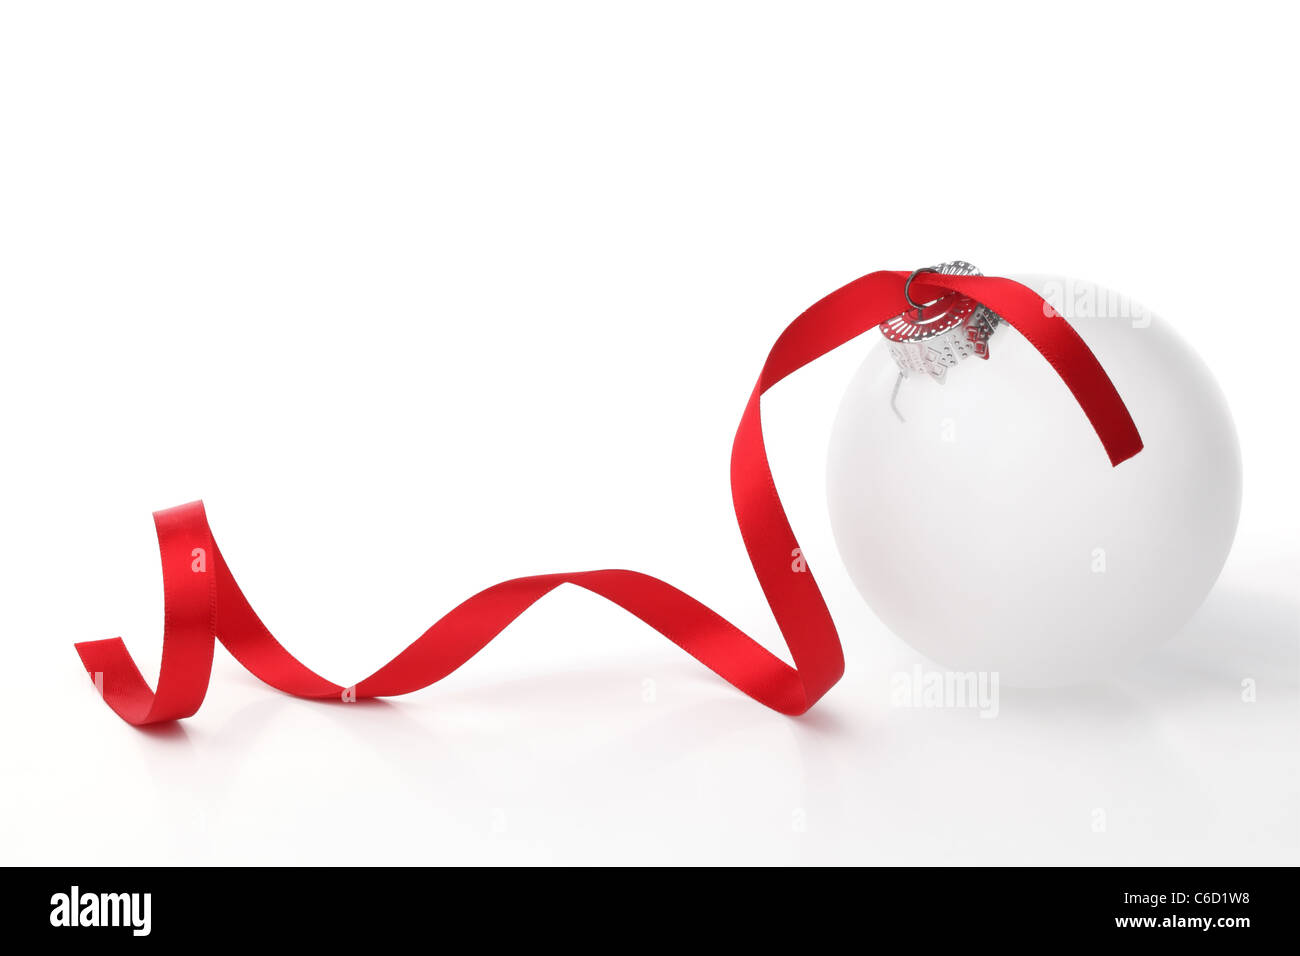 Boule de Noël blanche avec ruban sur fond blanc. Photo Stock